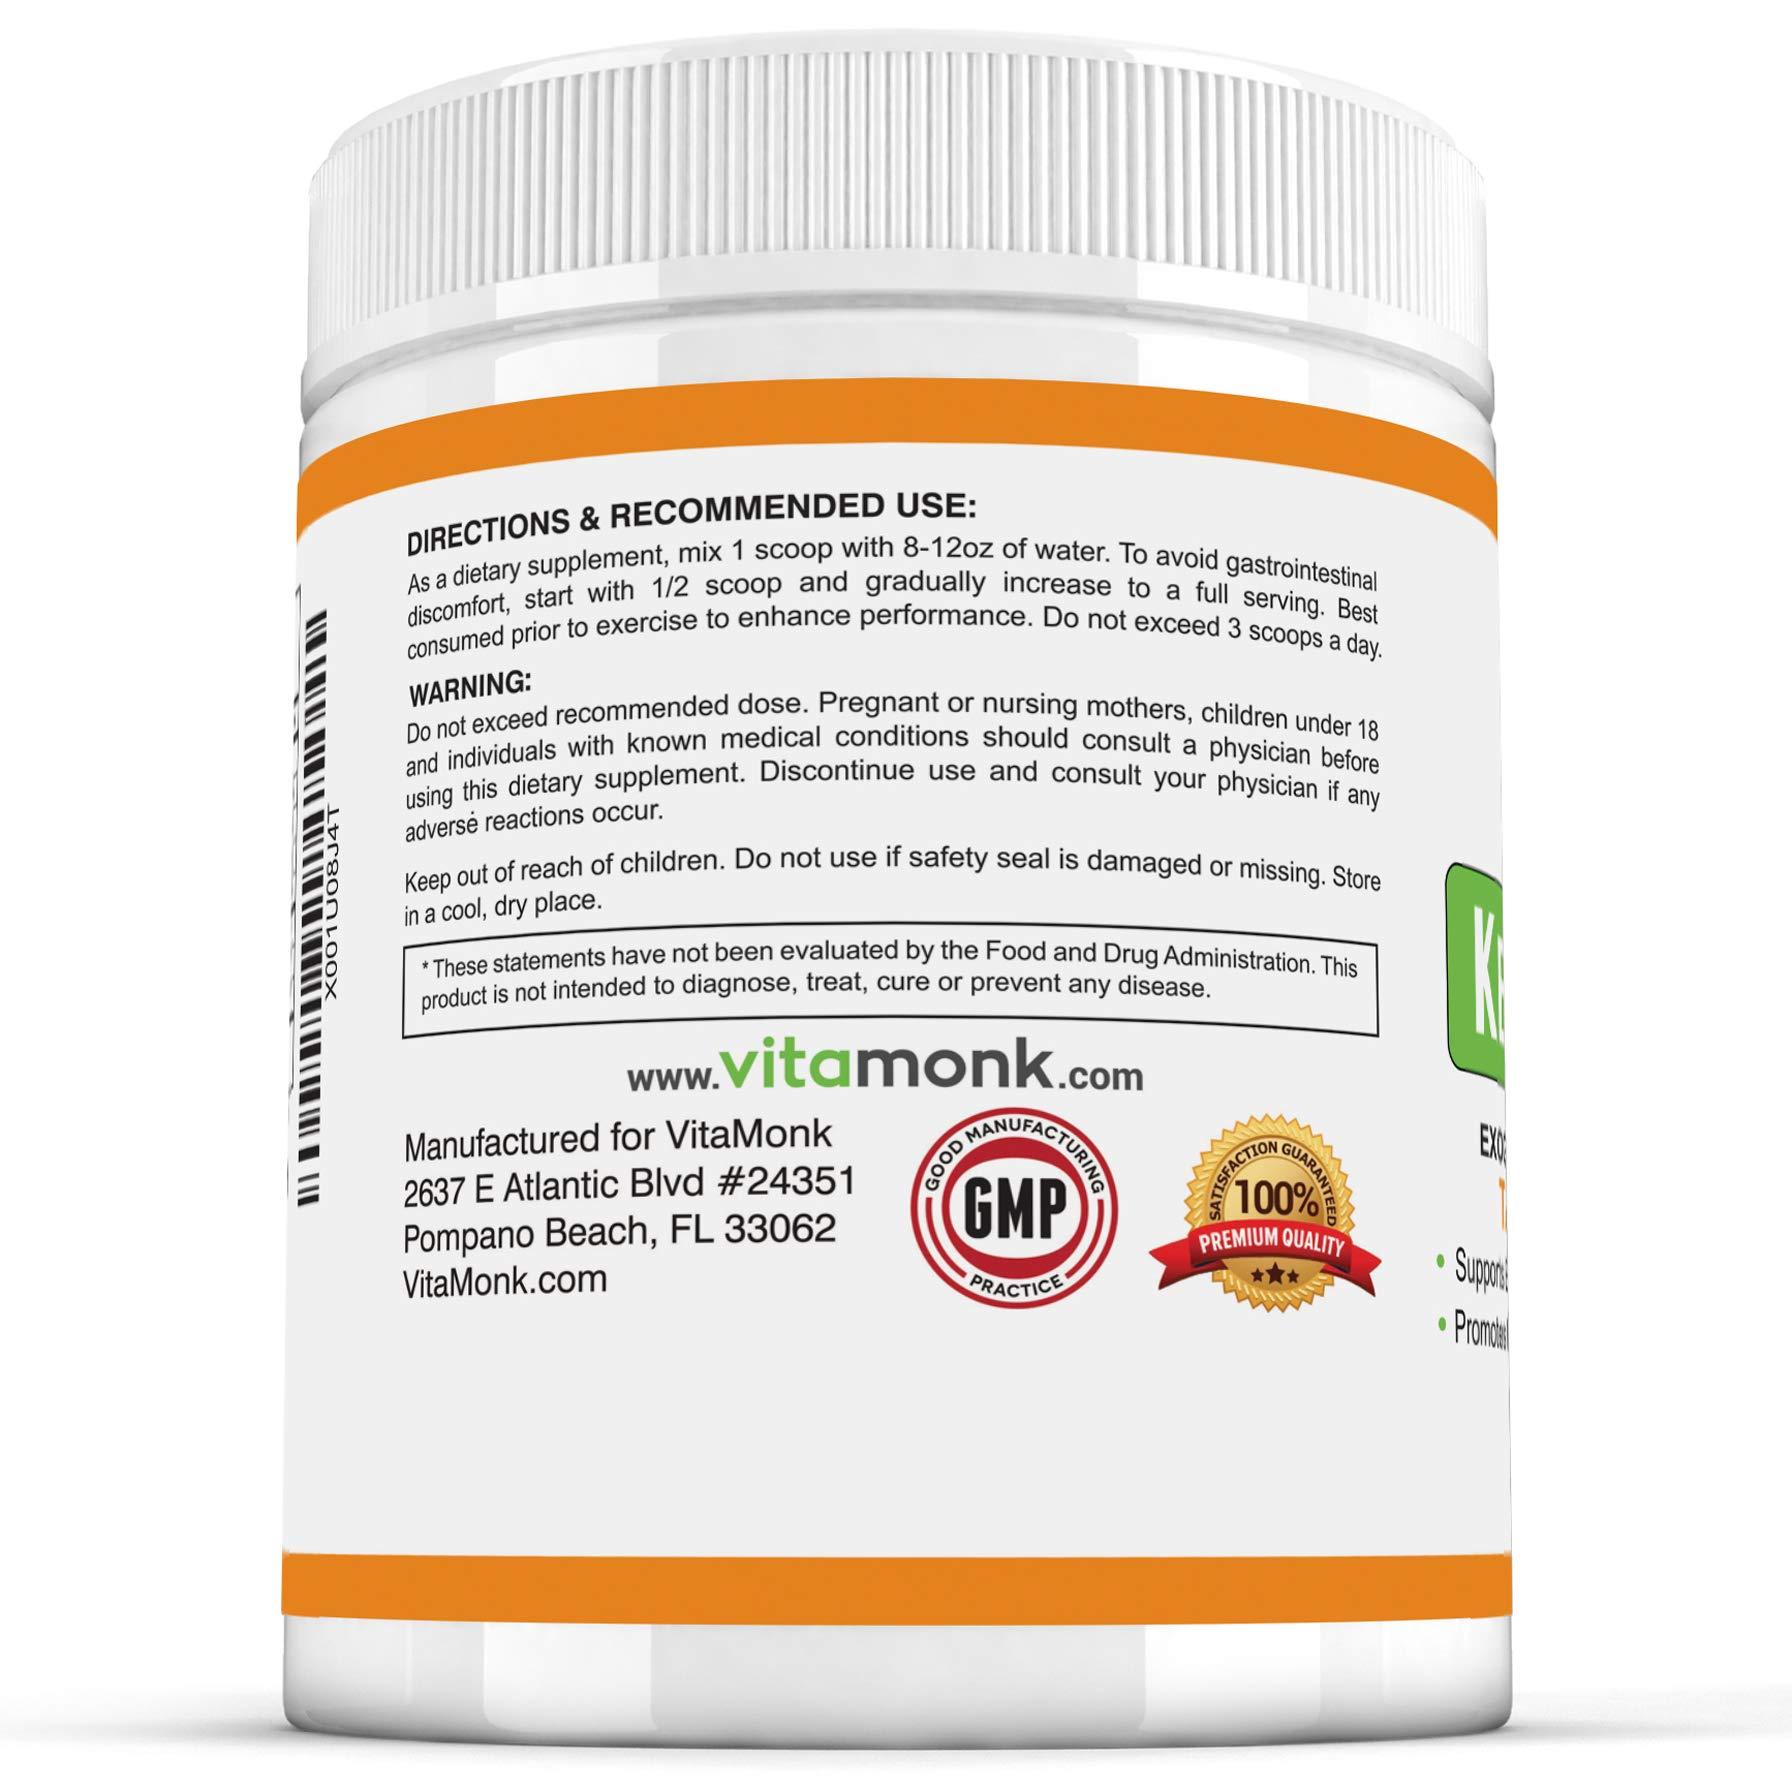 Ketosene XLTM 30 Servings Extra Large Exogenous Ketones Powder - Kickstart Ketosis Within 1-Hour with a Pure Blend of Calcium and Magnesium Ketone BHB Salts (KetoVantage® BHB) - Perfect Keto Diet Bulk by VitaMonk (Image #8)